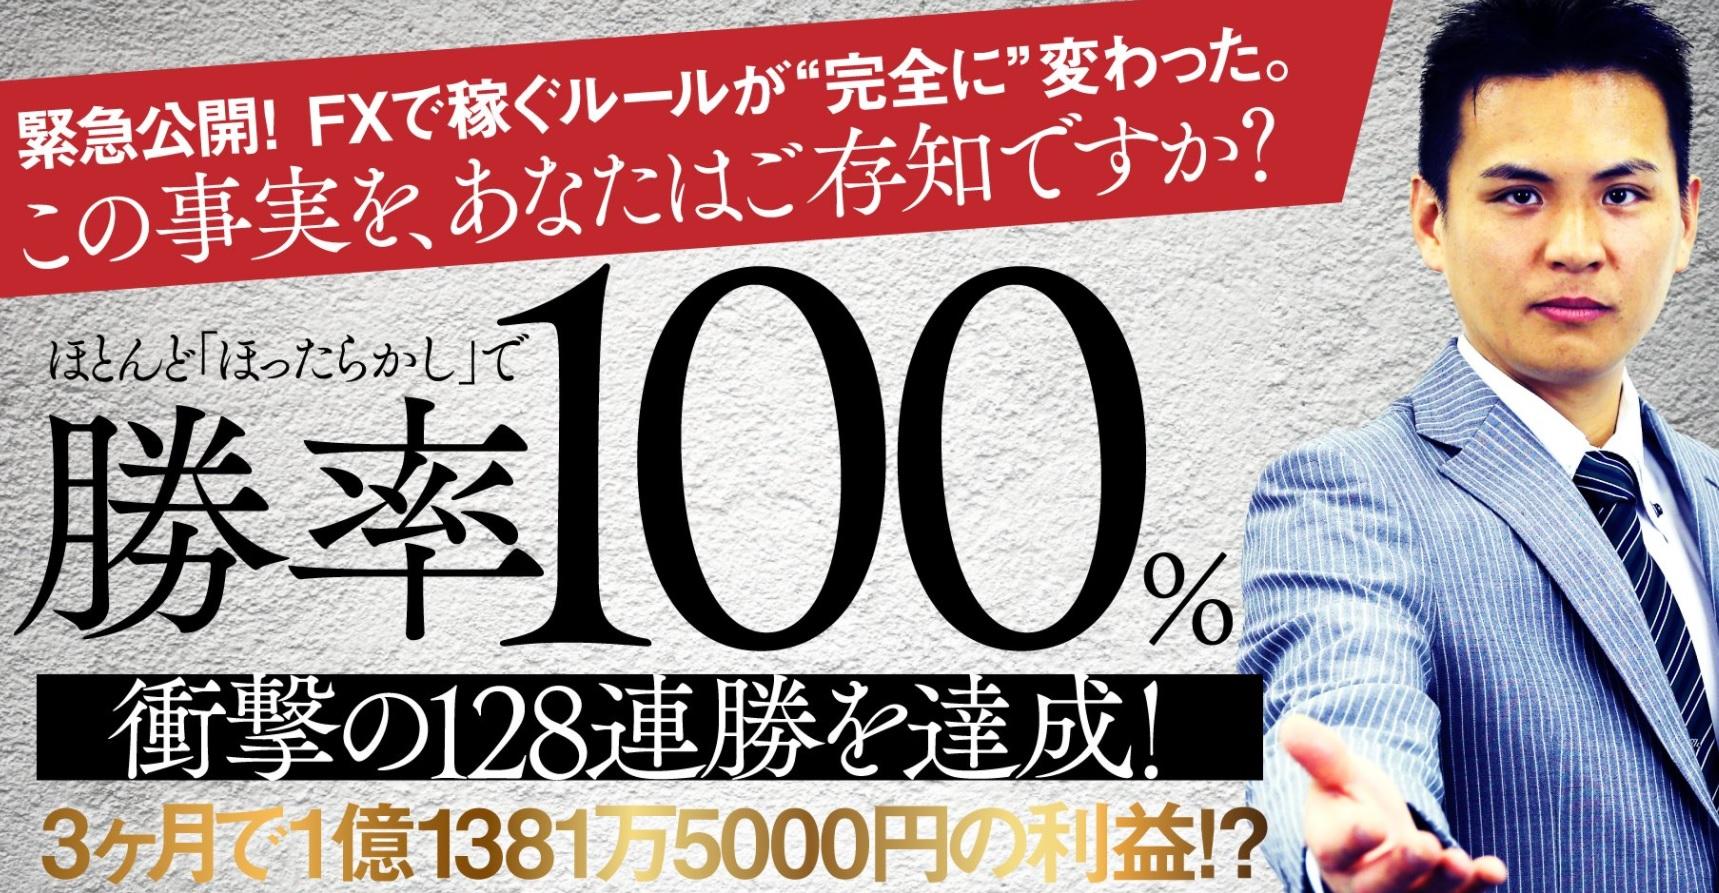 PR:勝率100%、衝撃の128連勝が可能になる!?FXの新ルール